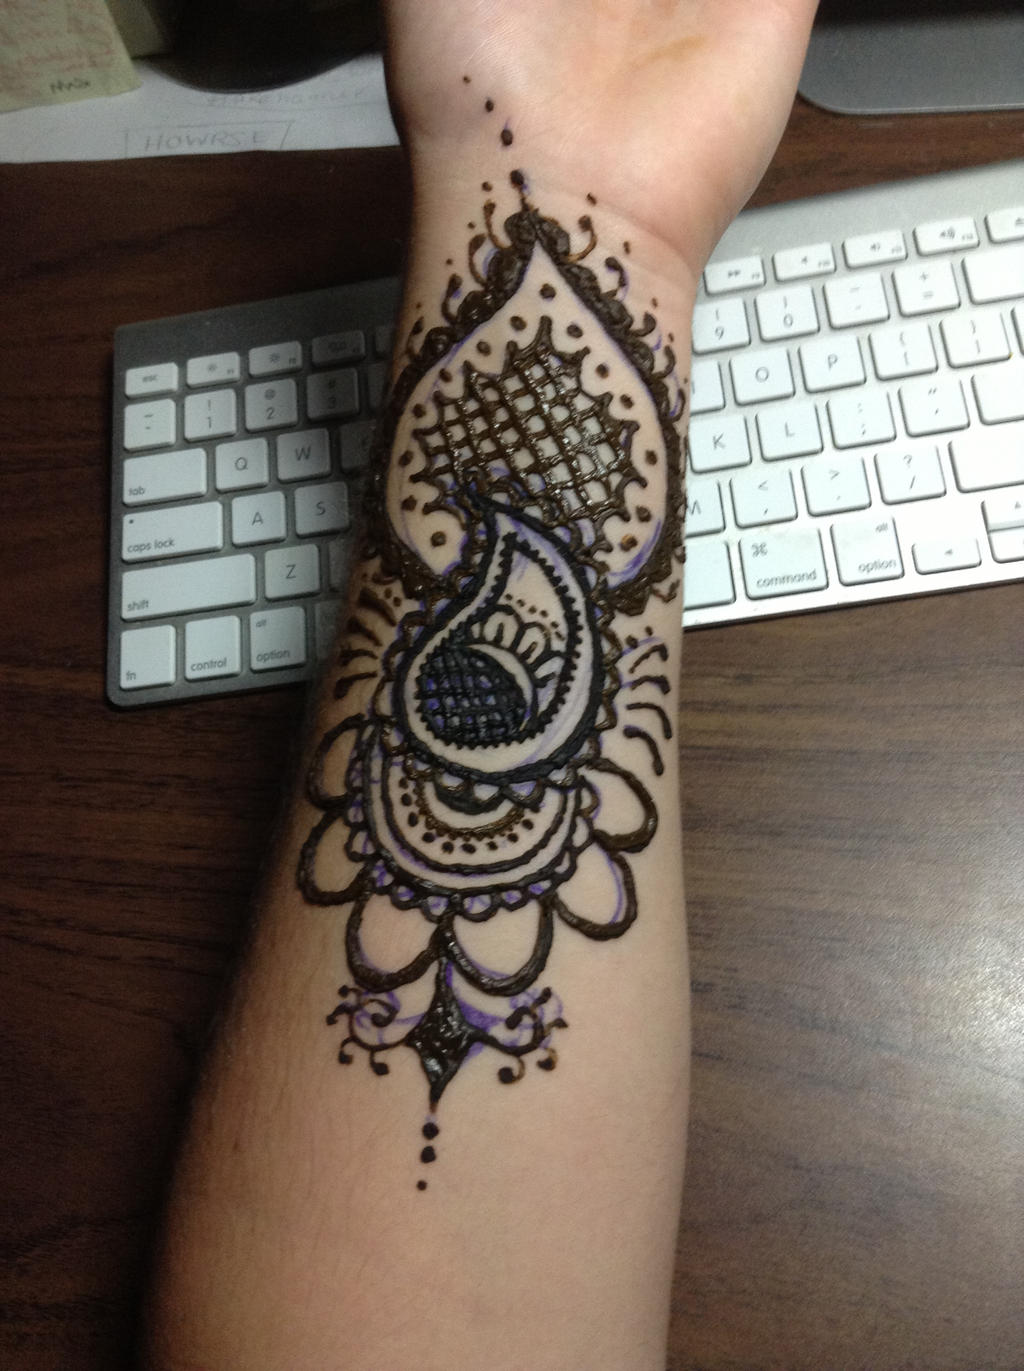 Henna Tattoo Arm : Henna arm tattoo by blackwaterpanther on deviantart